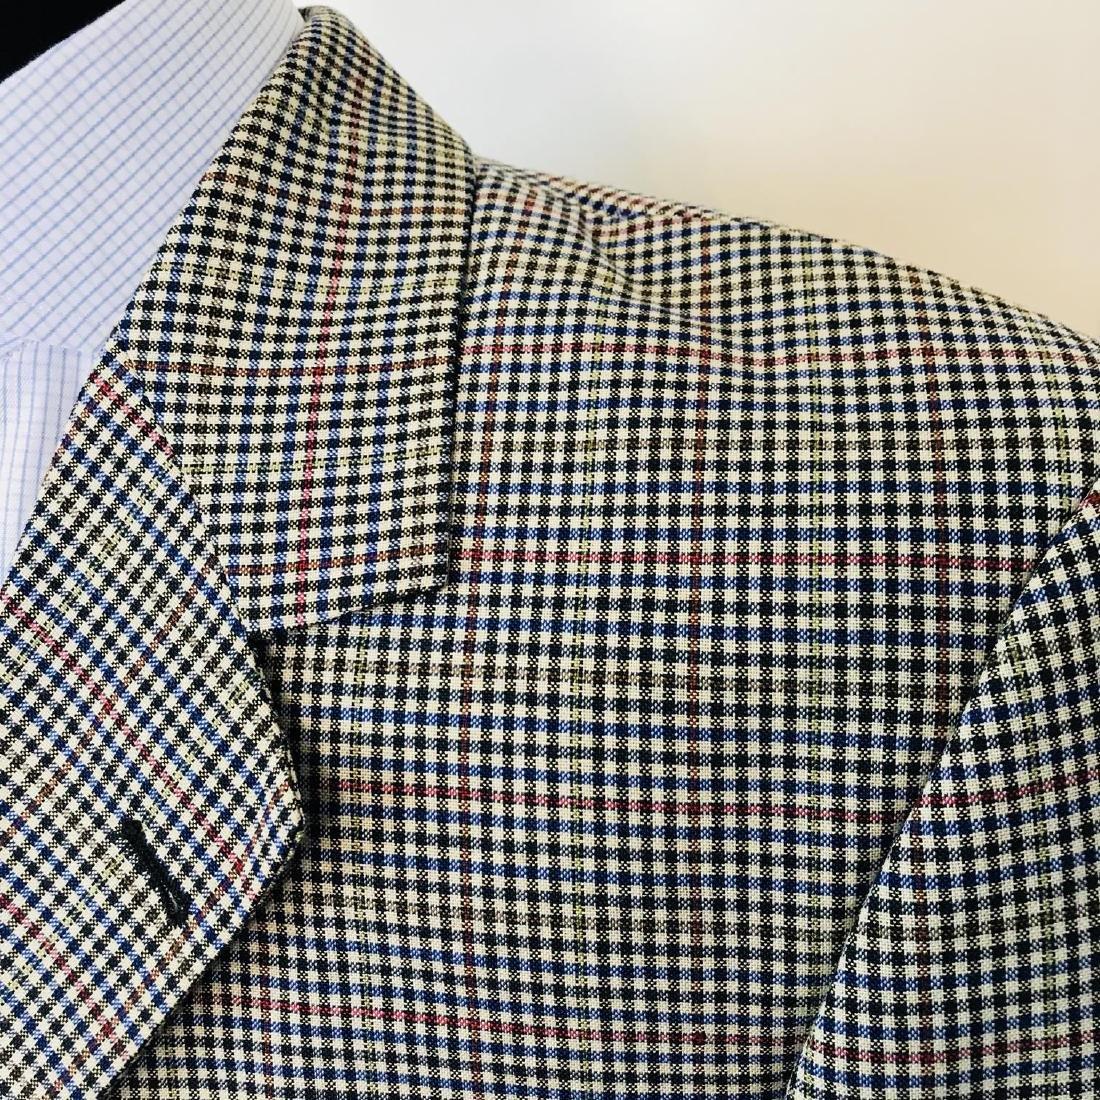 Vintage Men's Paolo Negrato Jacket Blazer Size US 40 - 3